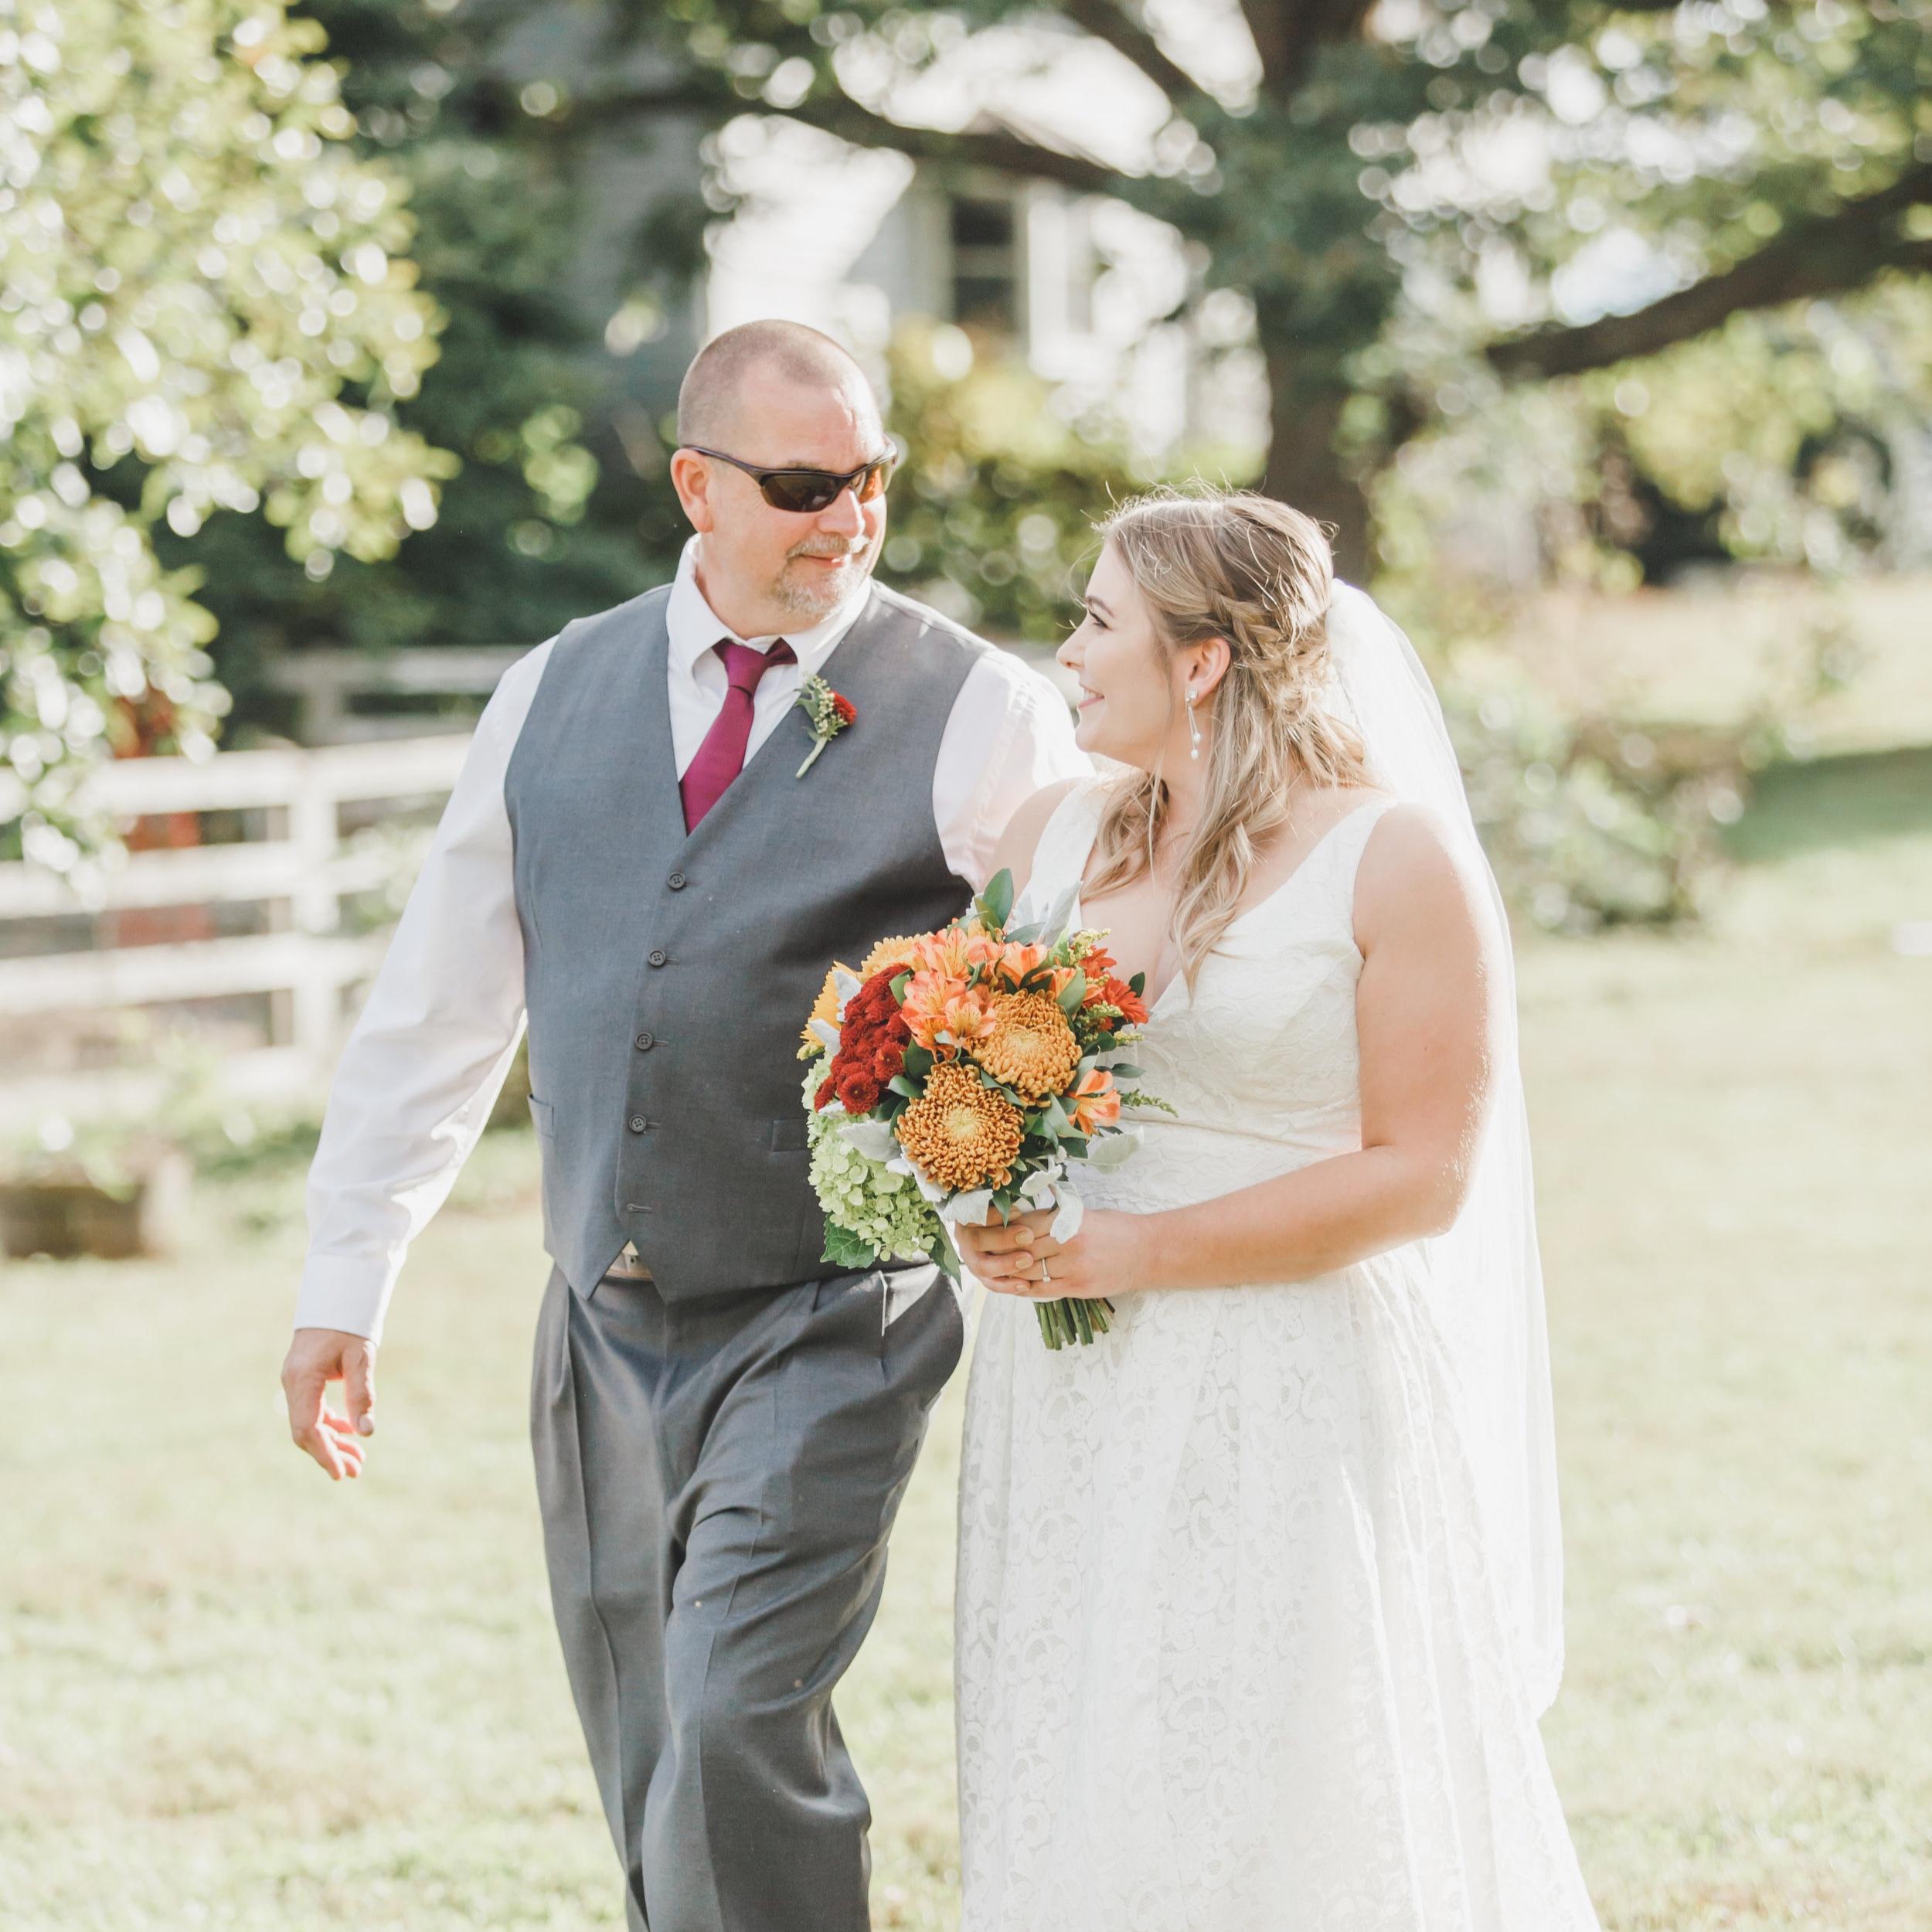 Fling - Virginia Wedding Photographer - Photography by Amy Nicole-1020-13.jpg